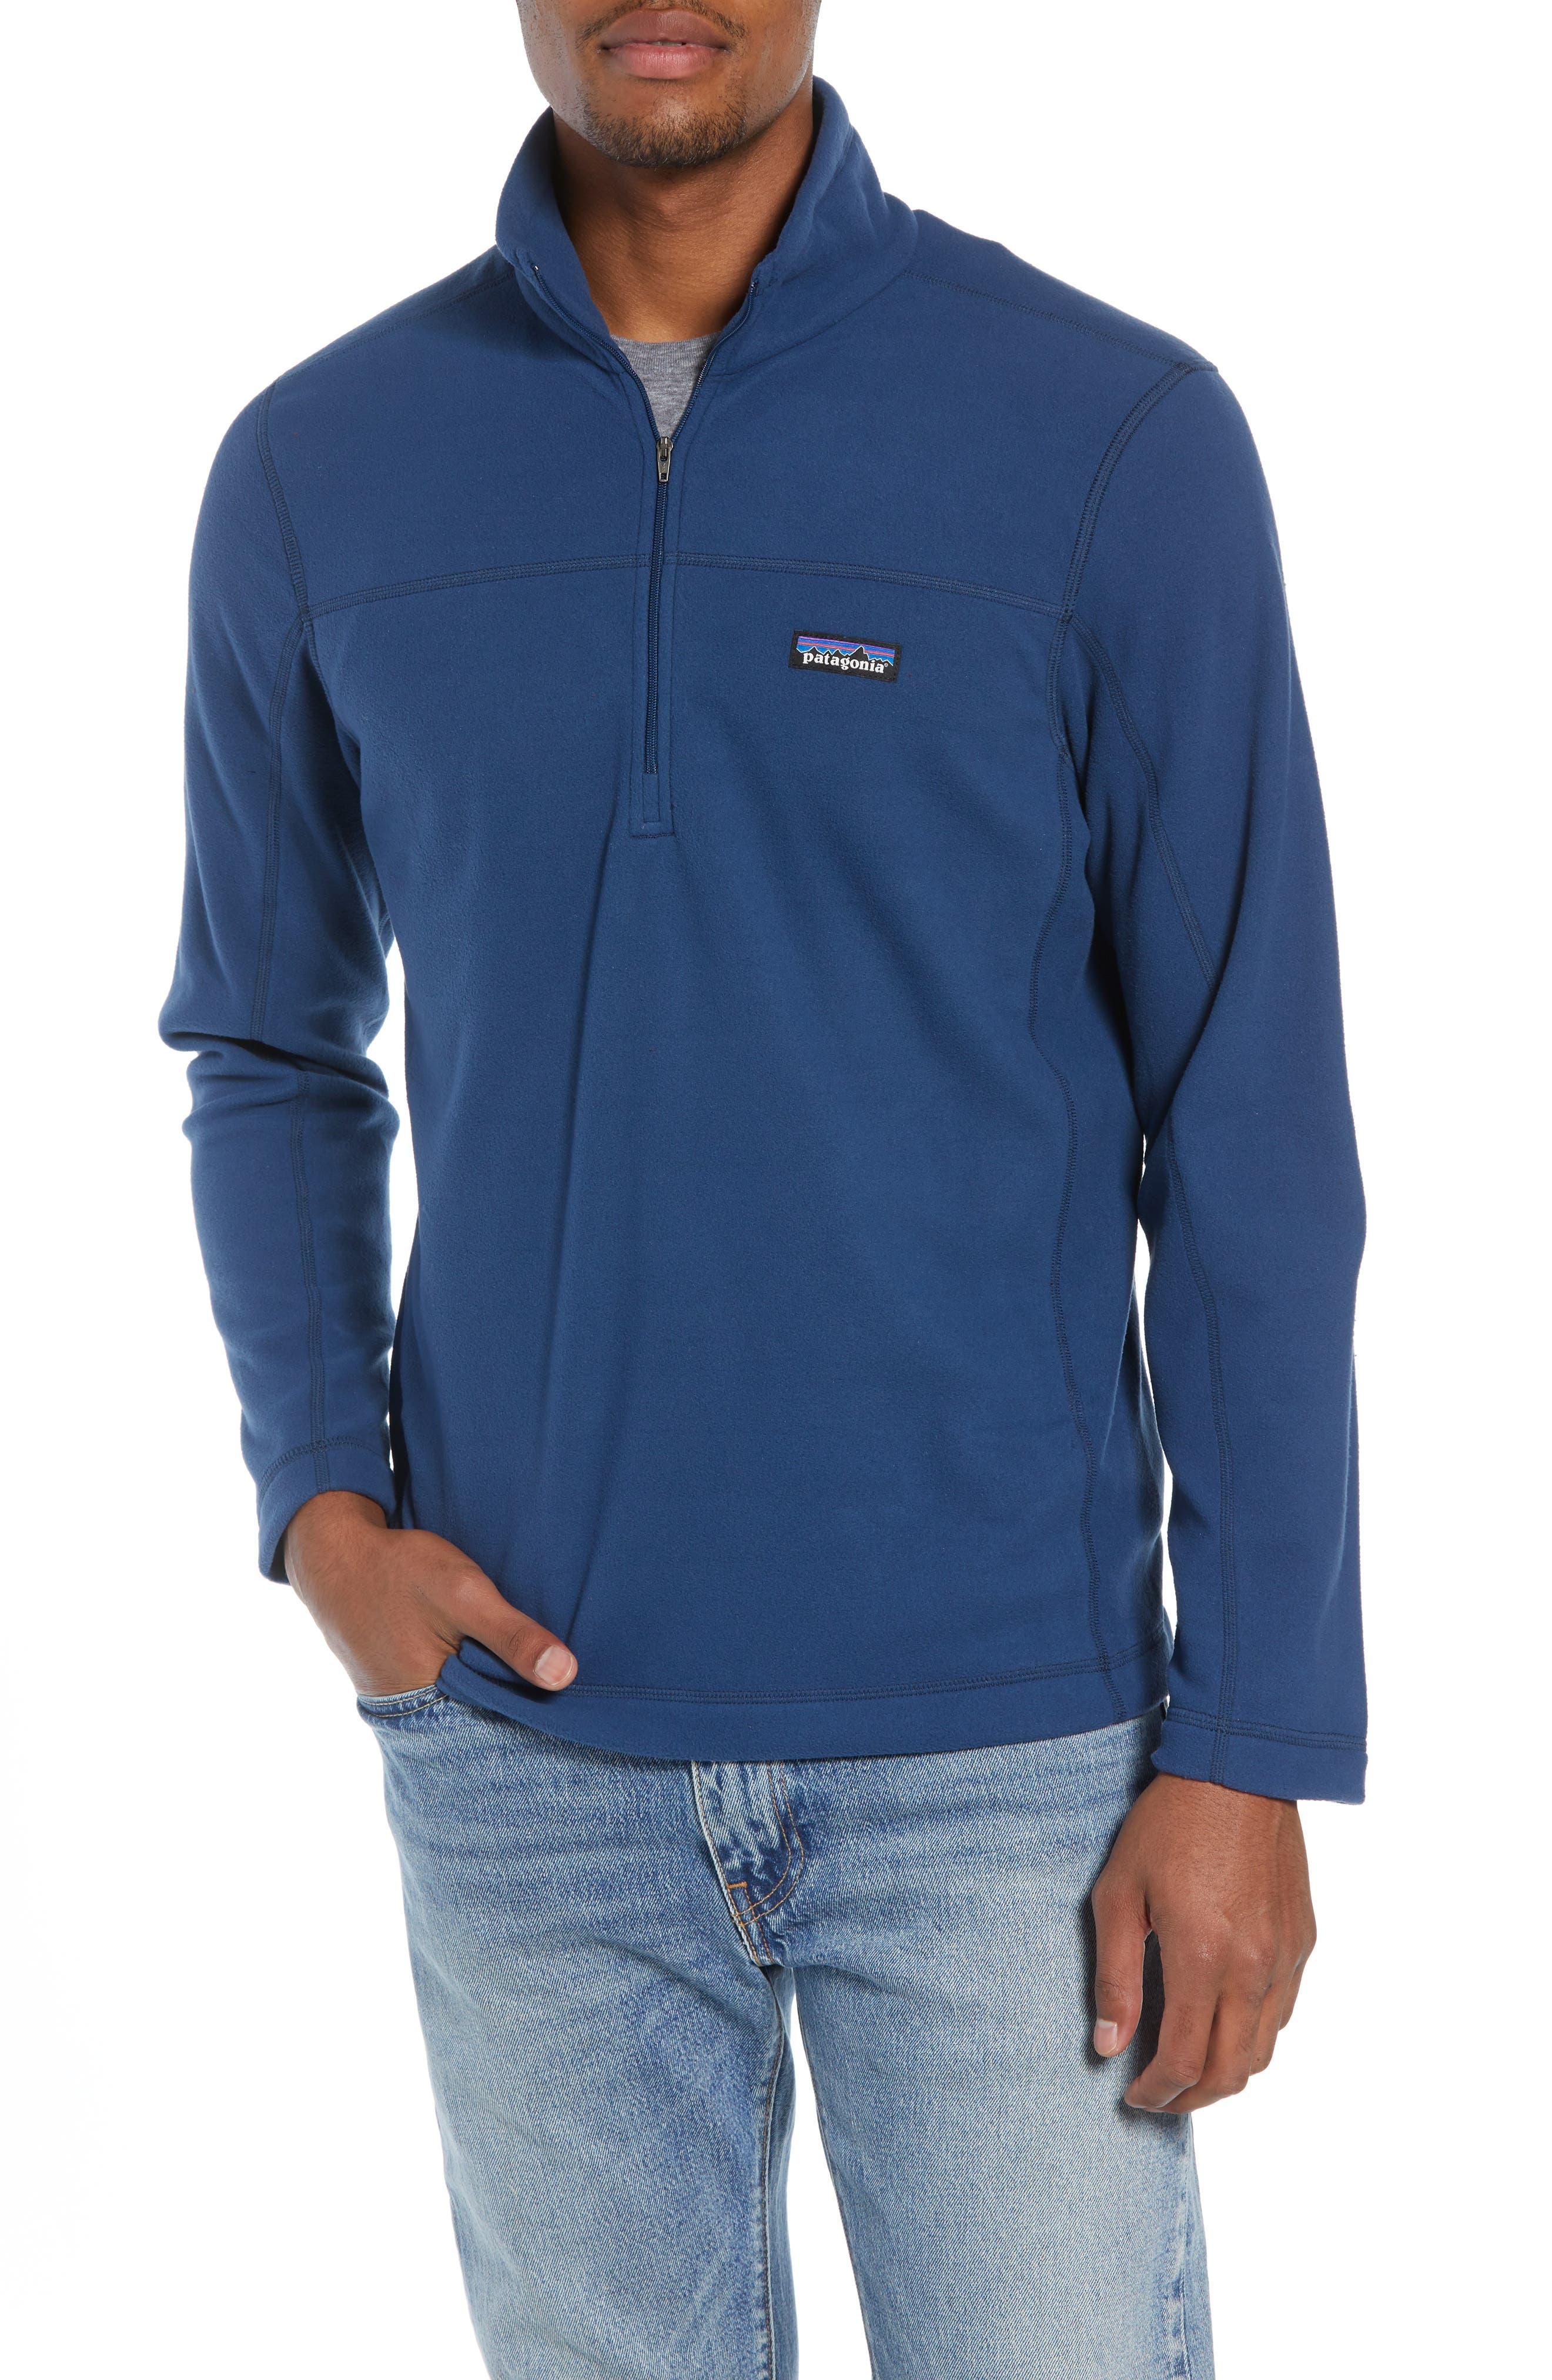 Fleece Pullover,                         Main,                         color, STONE BLUE